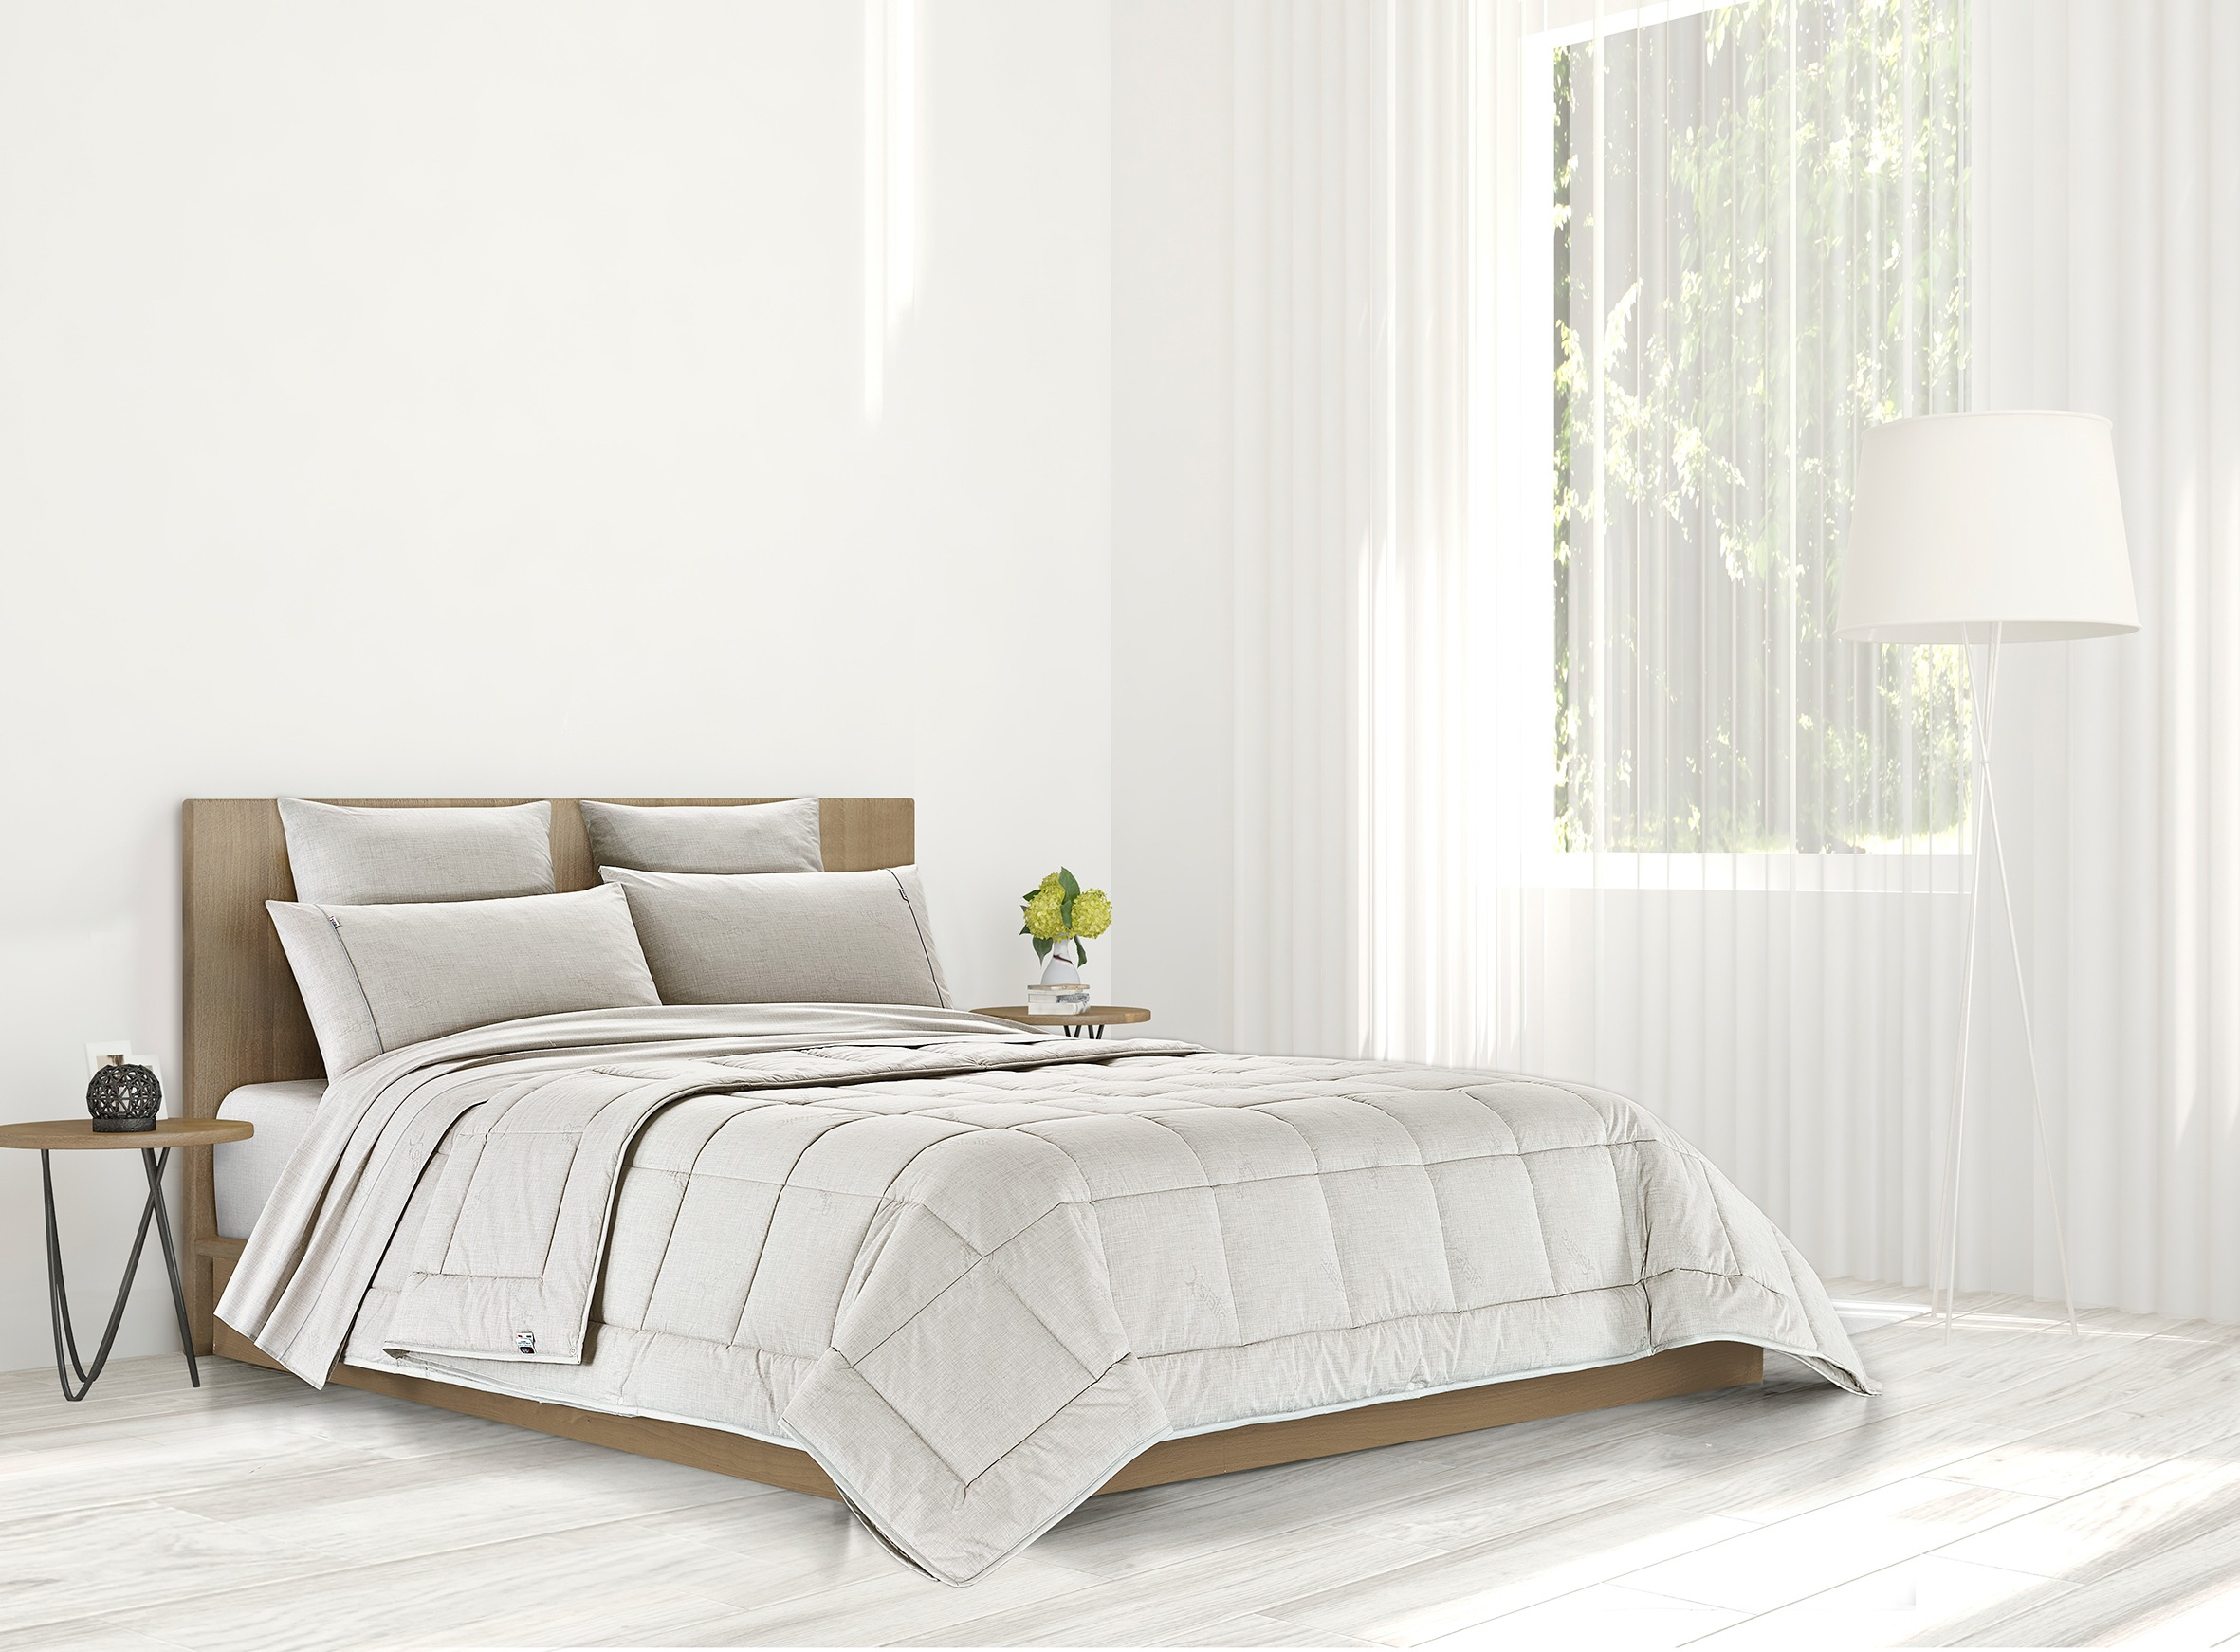 Bedroom with SilverPro four season duvet